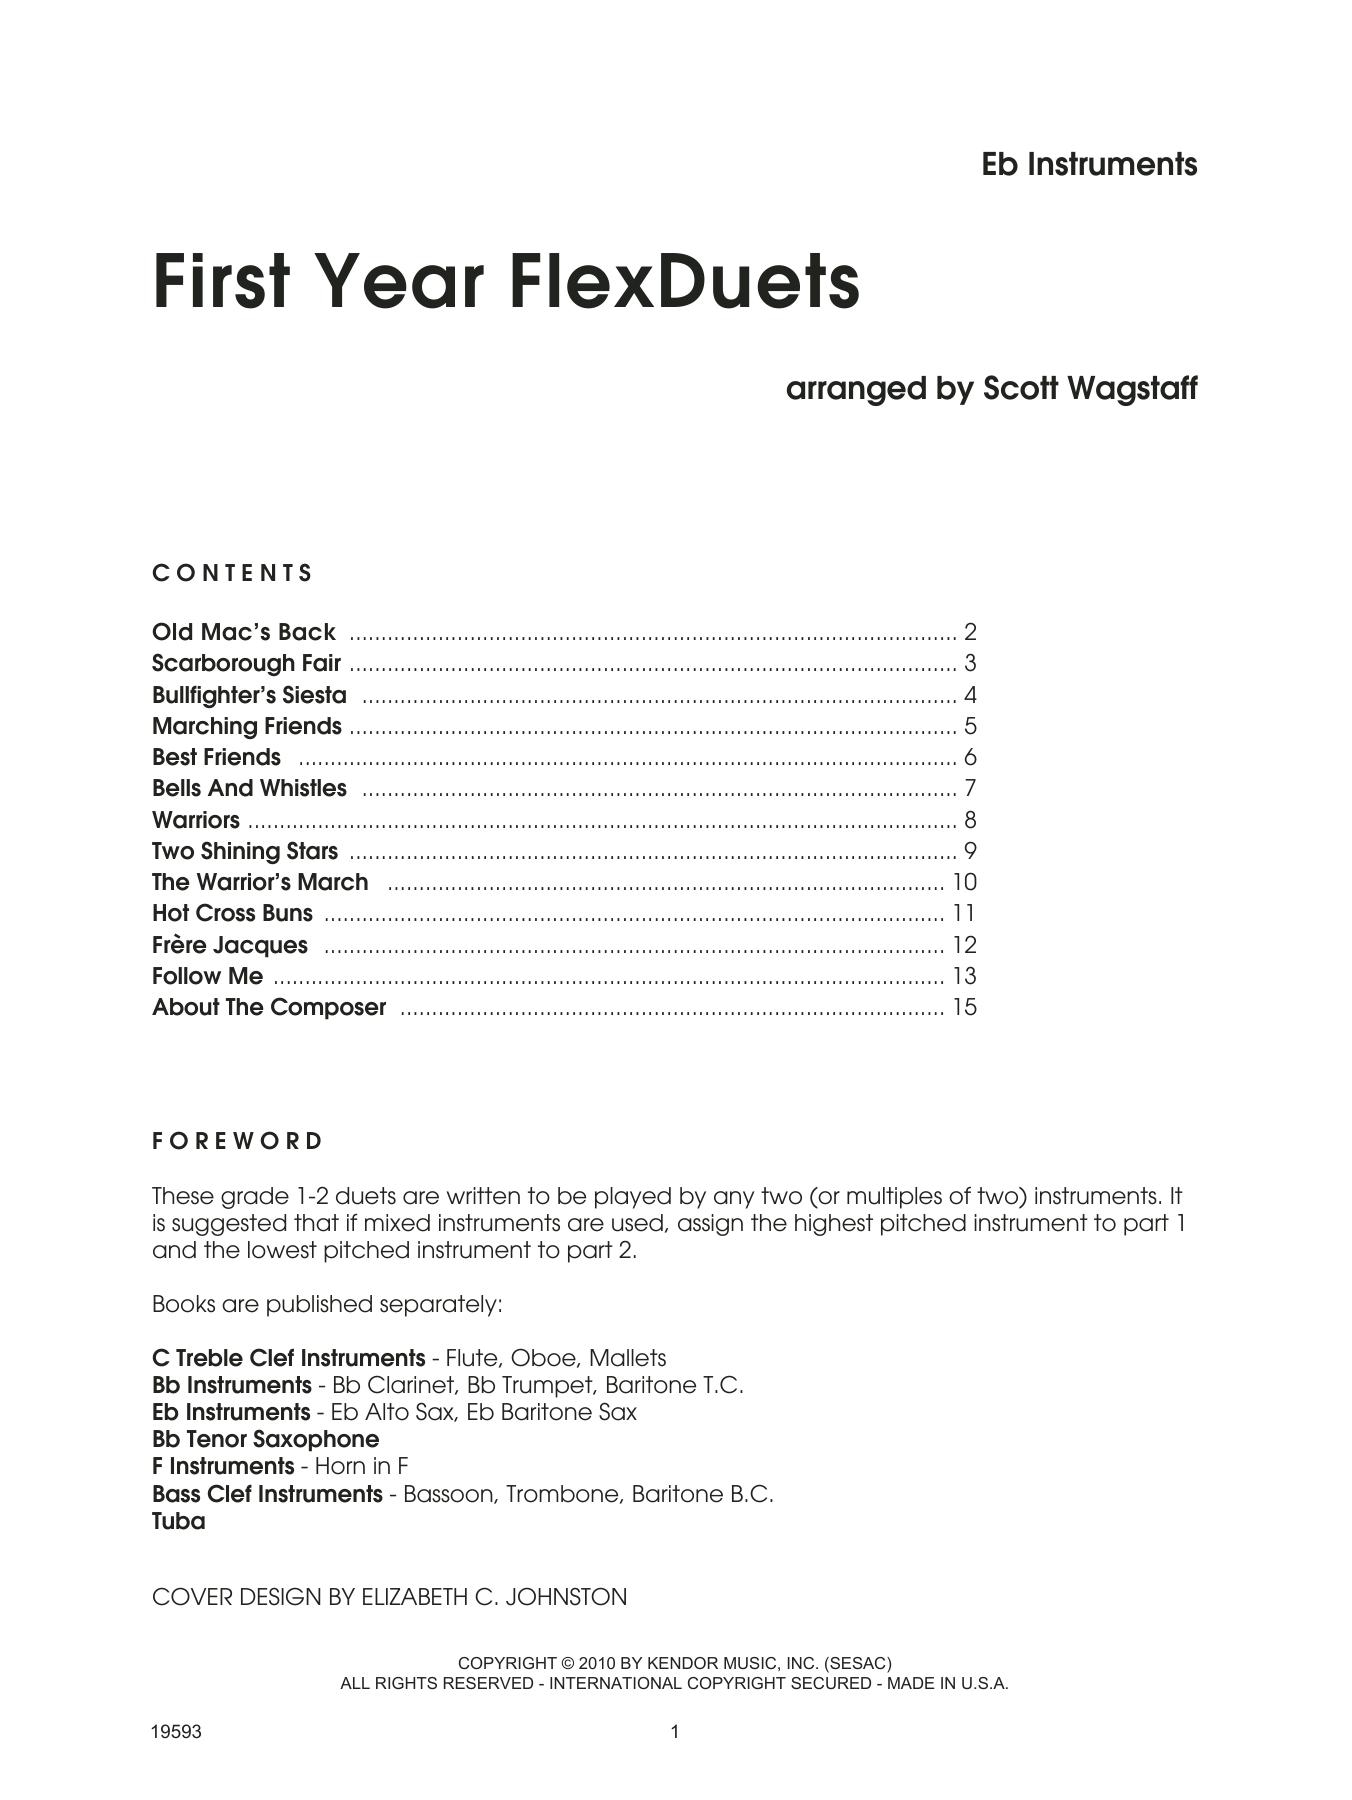 First Year FLexDuets - Eb Instruments Partituras Digitales